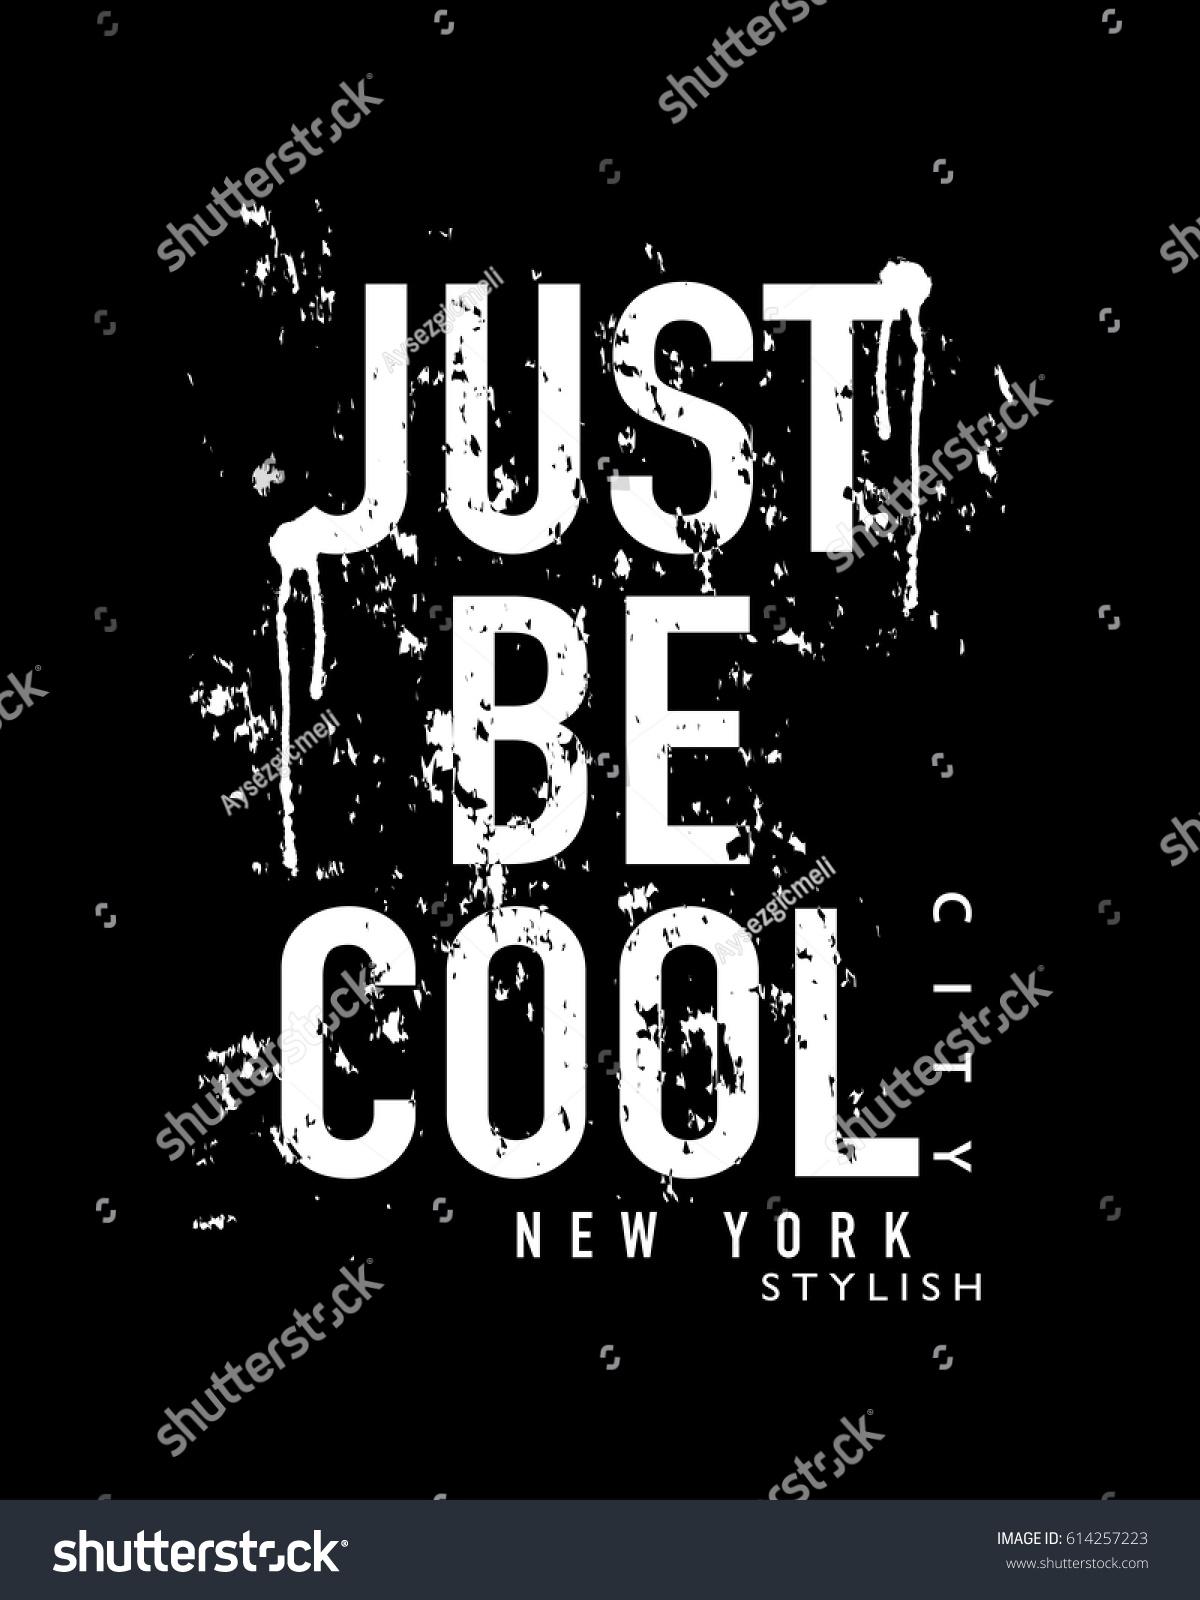 Design t shirts graphic - T Shirt Graphics Slogan Tee Print Design Just Be Cool